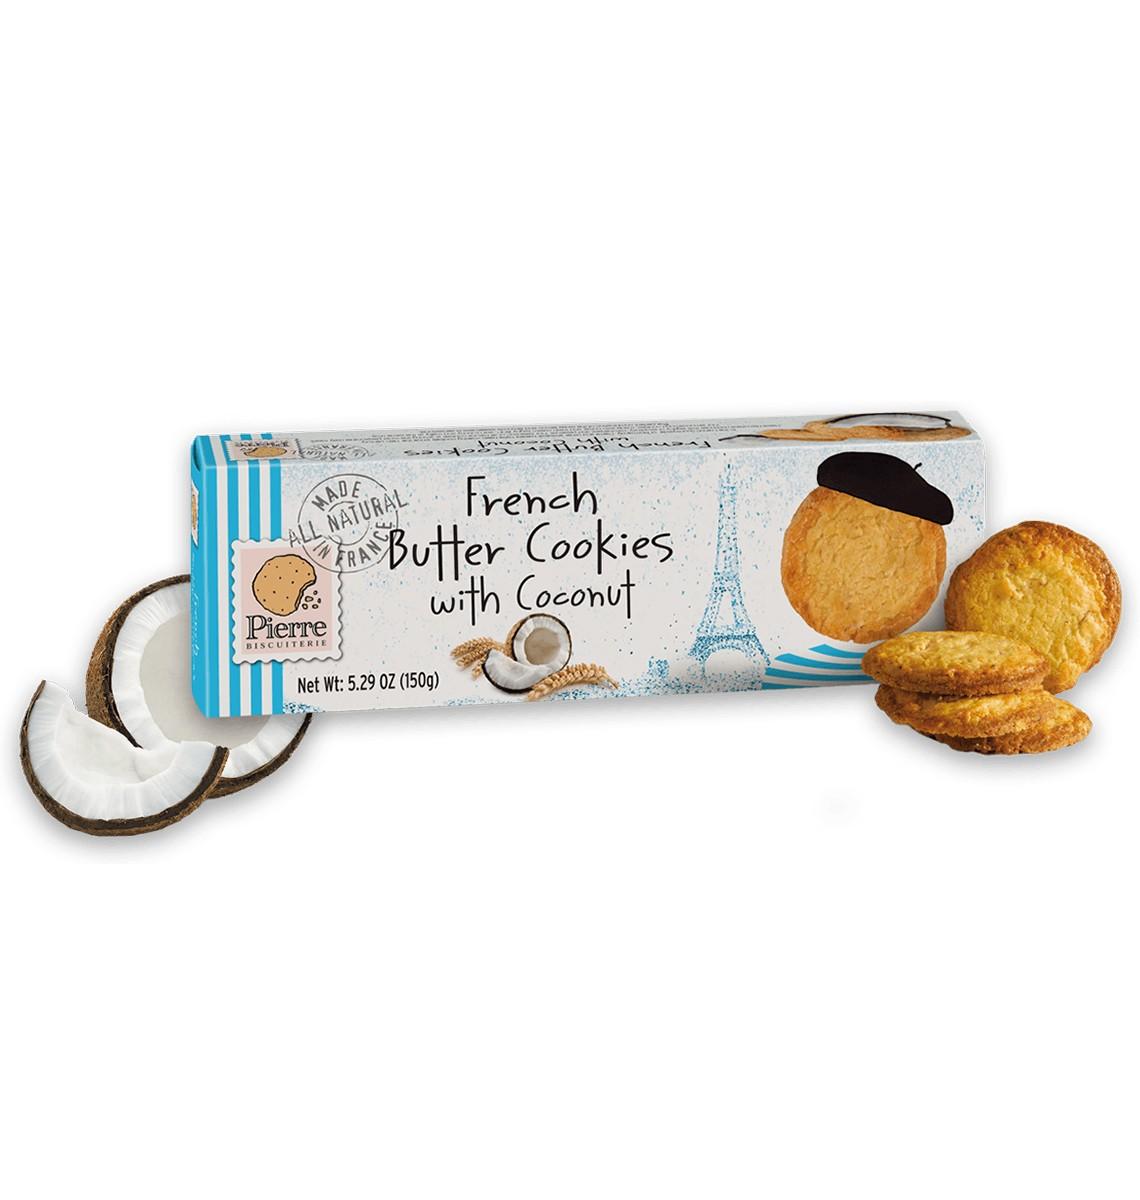 Печенье французское сливочное с кокосом Pierre Biscuiterie фото